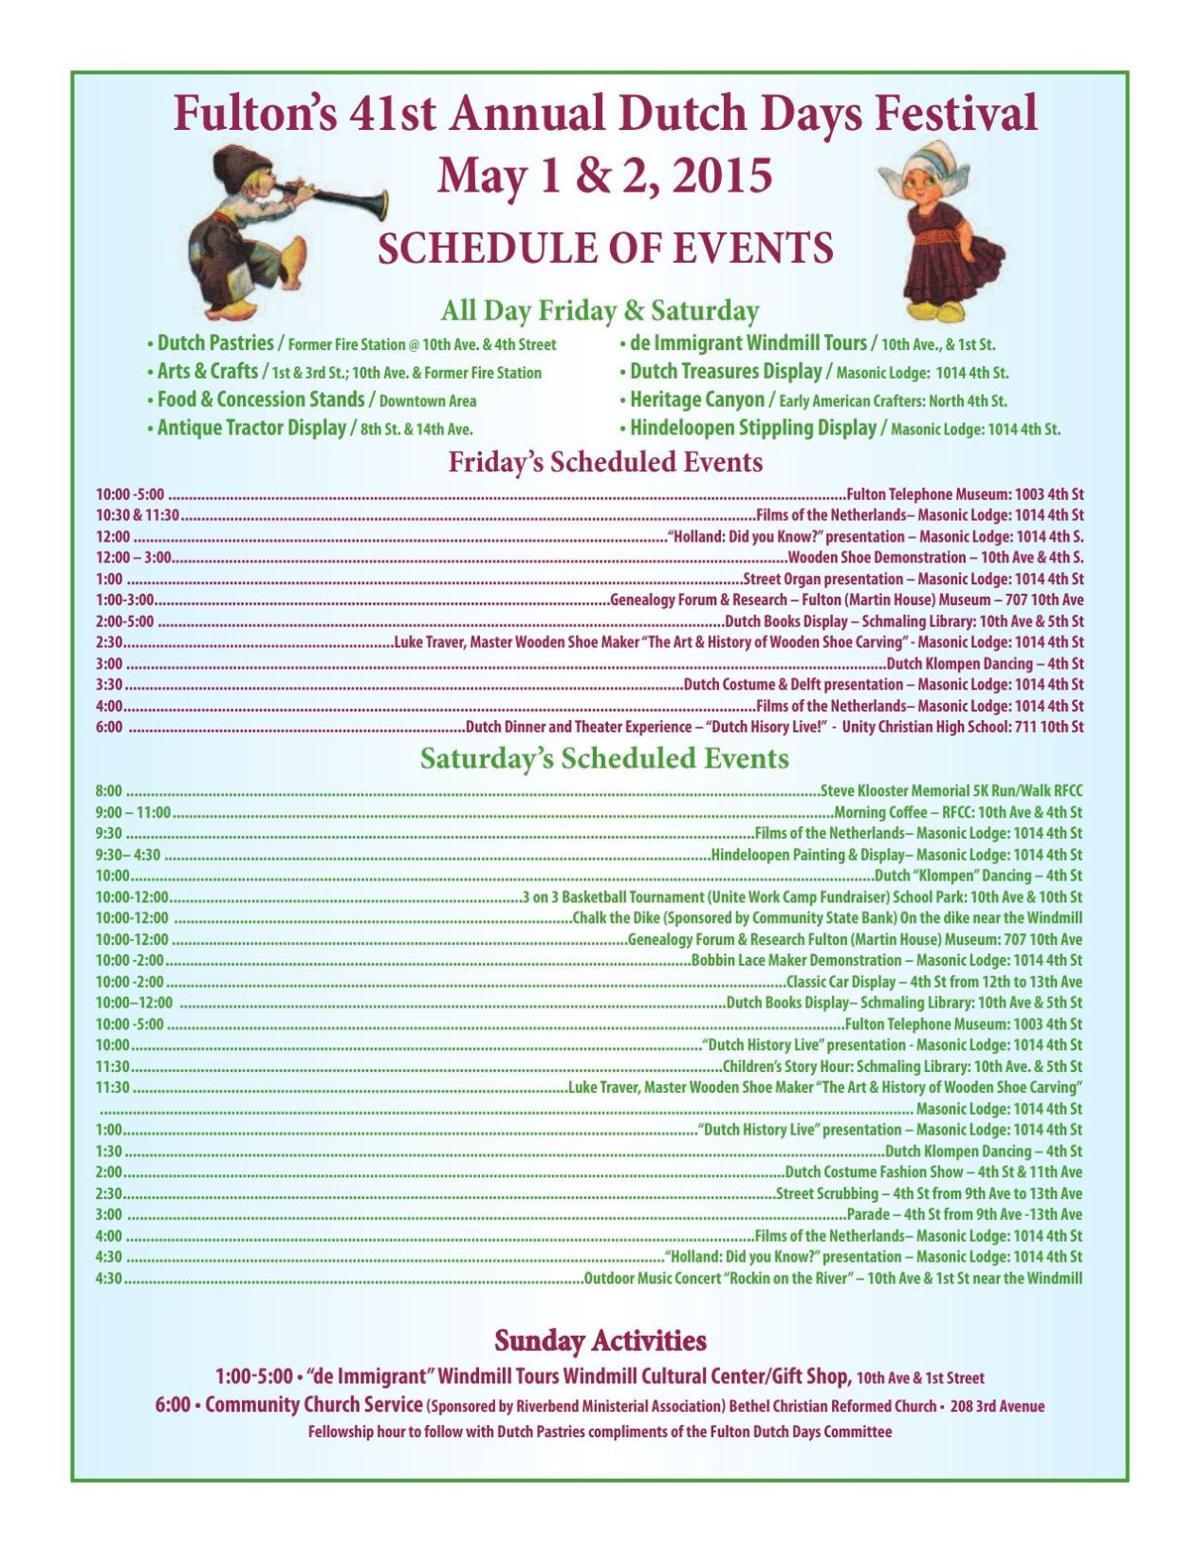 2015 Dutch Days Schedule of Events